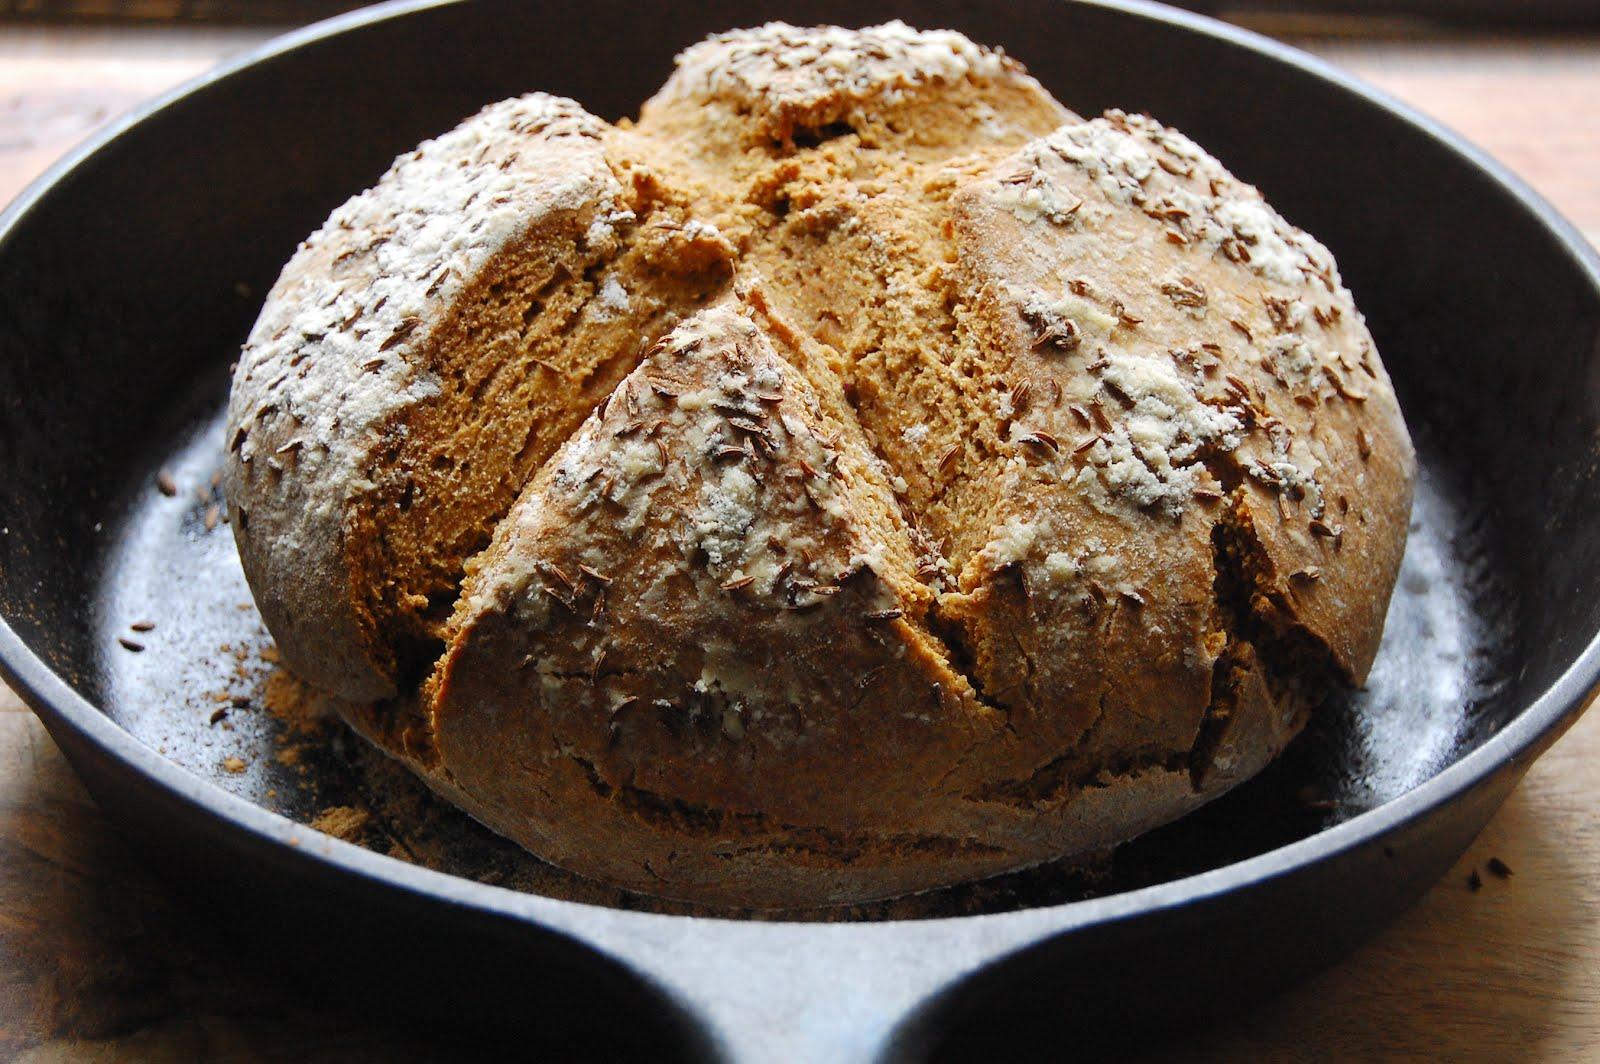 palate/palette/plate: Rye-Cornmeal Soda Bread